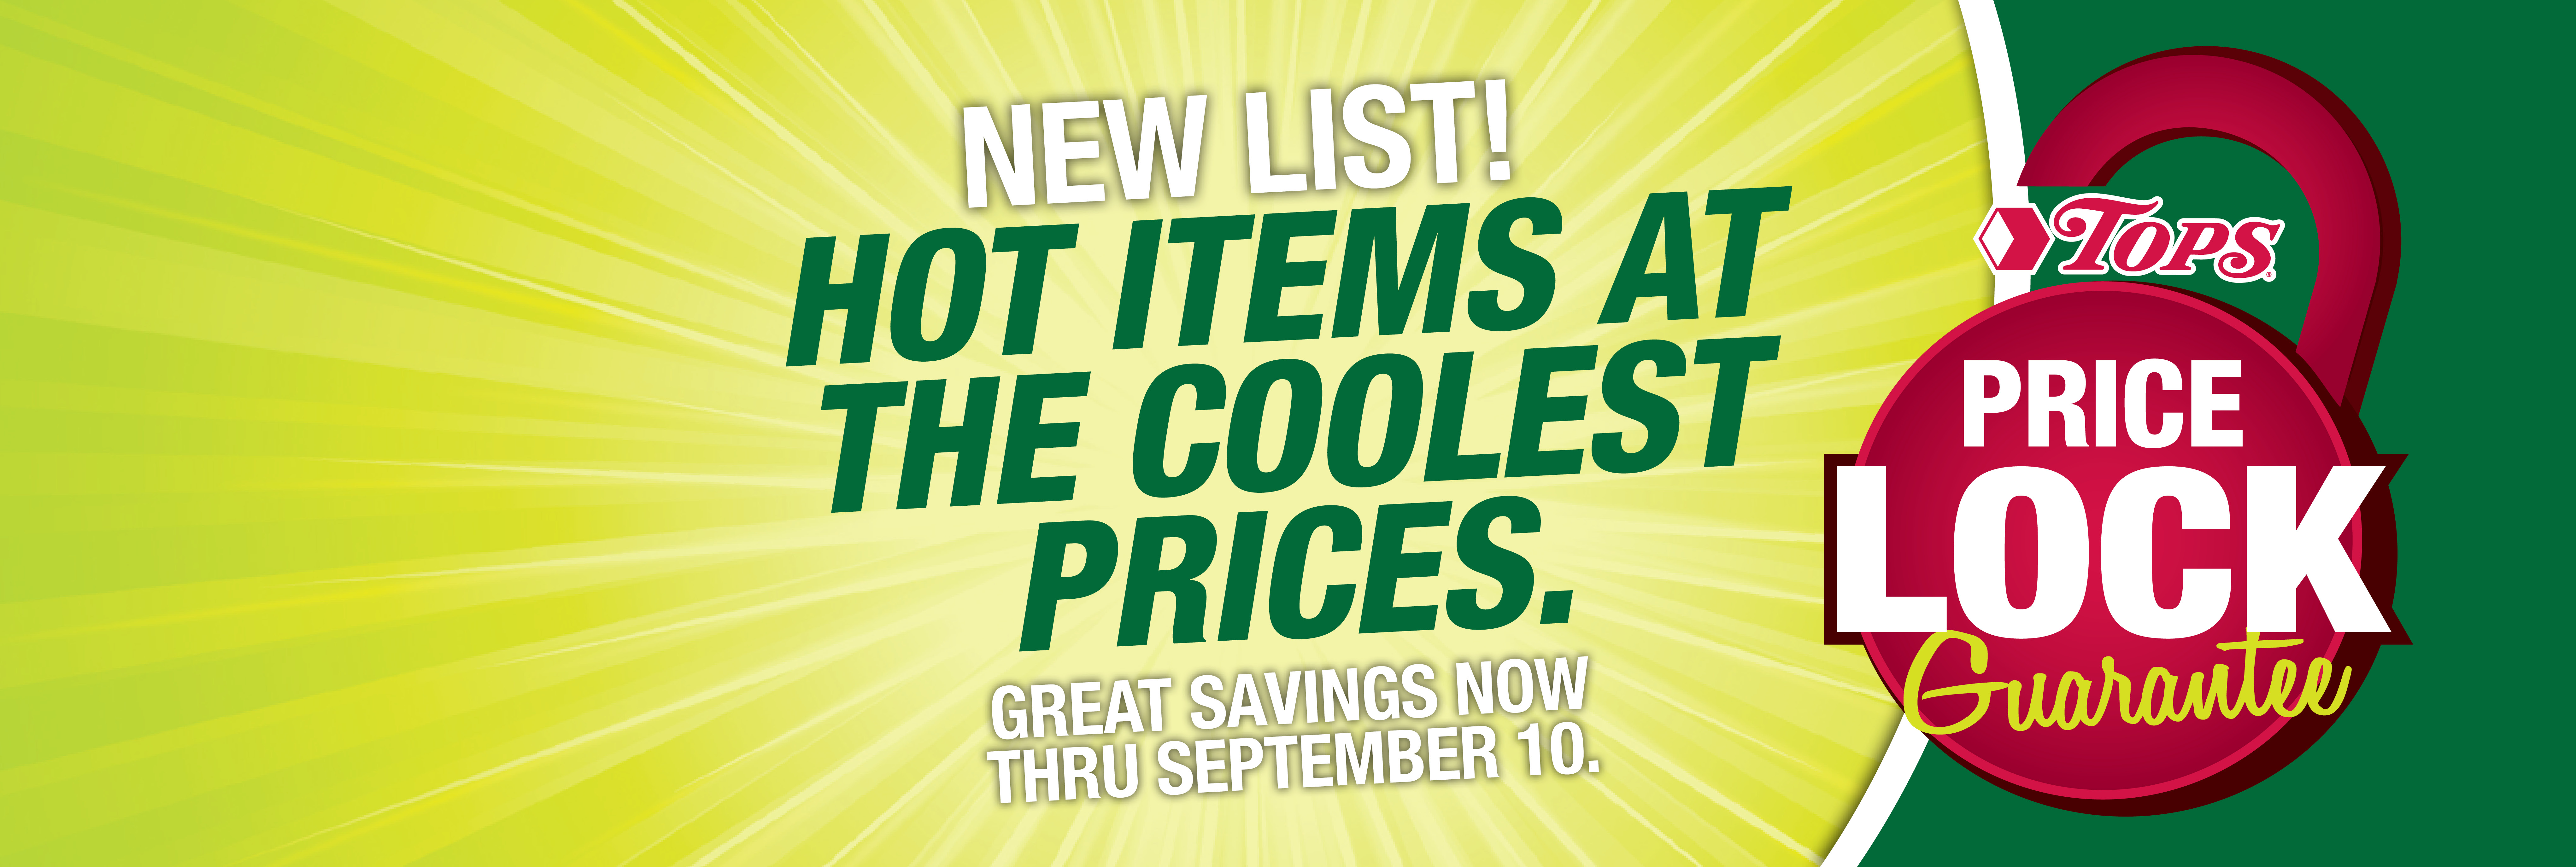 New Price Lock Items Through September 10